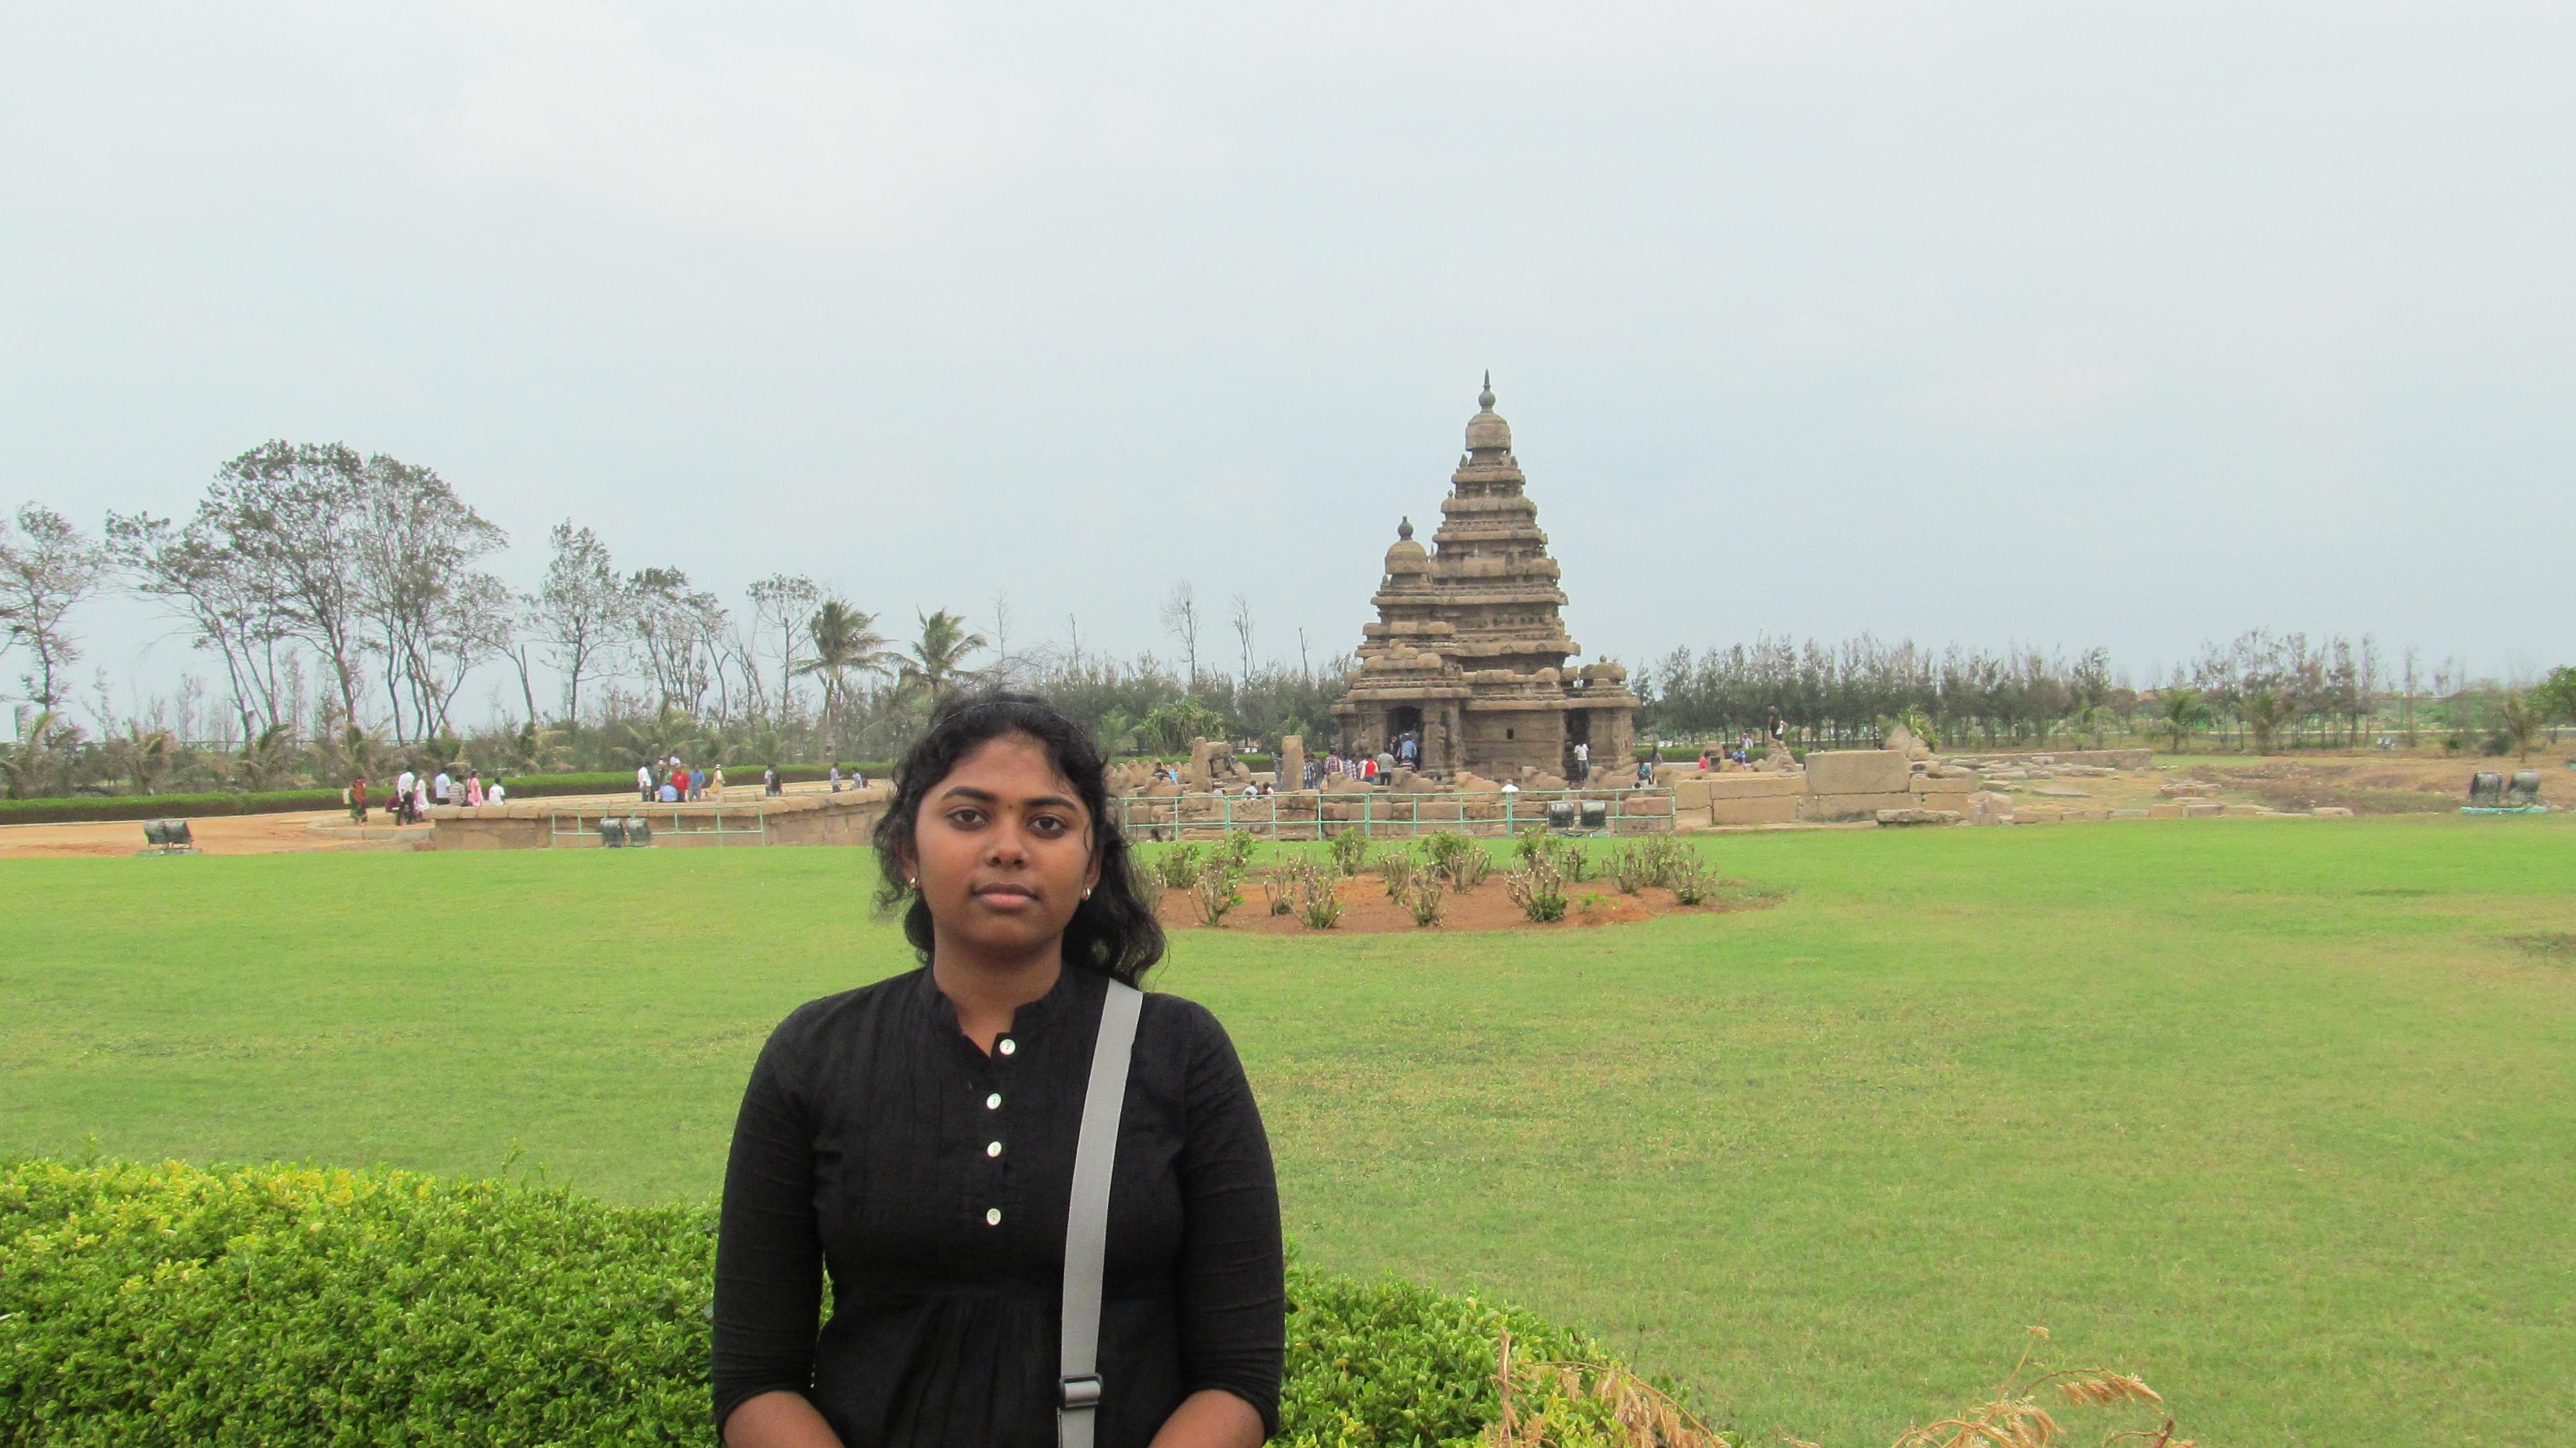 Temple at Mahabalipuram Group of Monuments at Mahabalipuram - India Nithka K